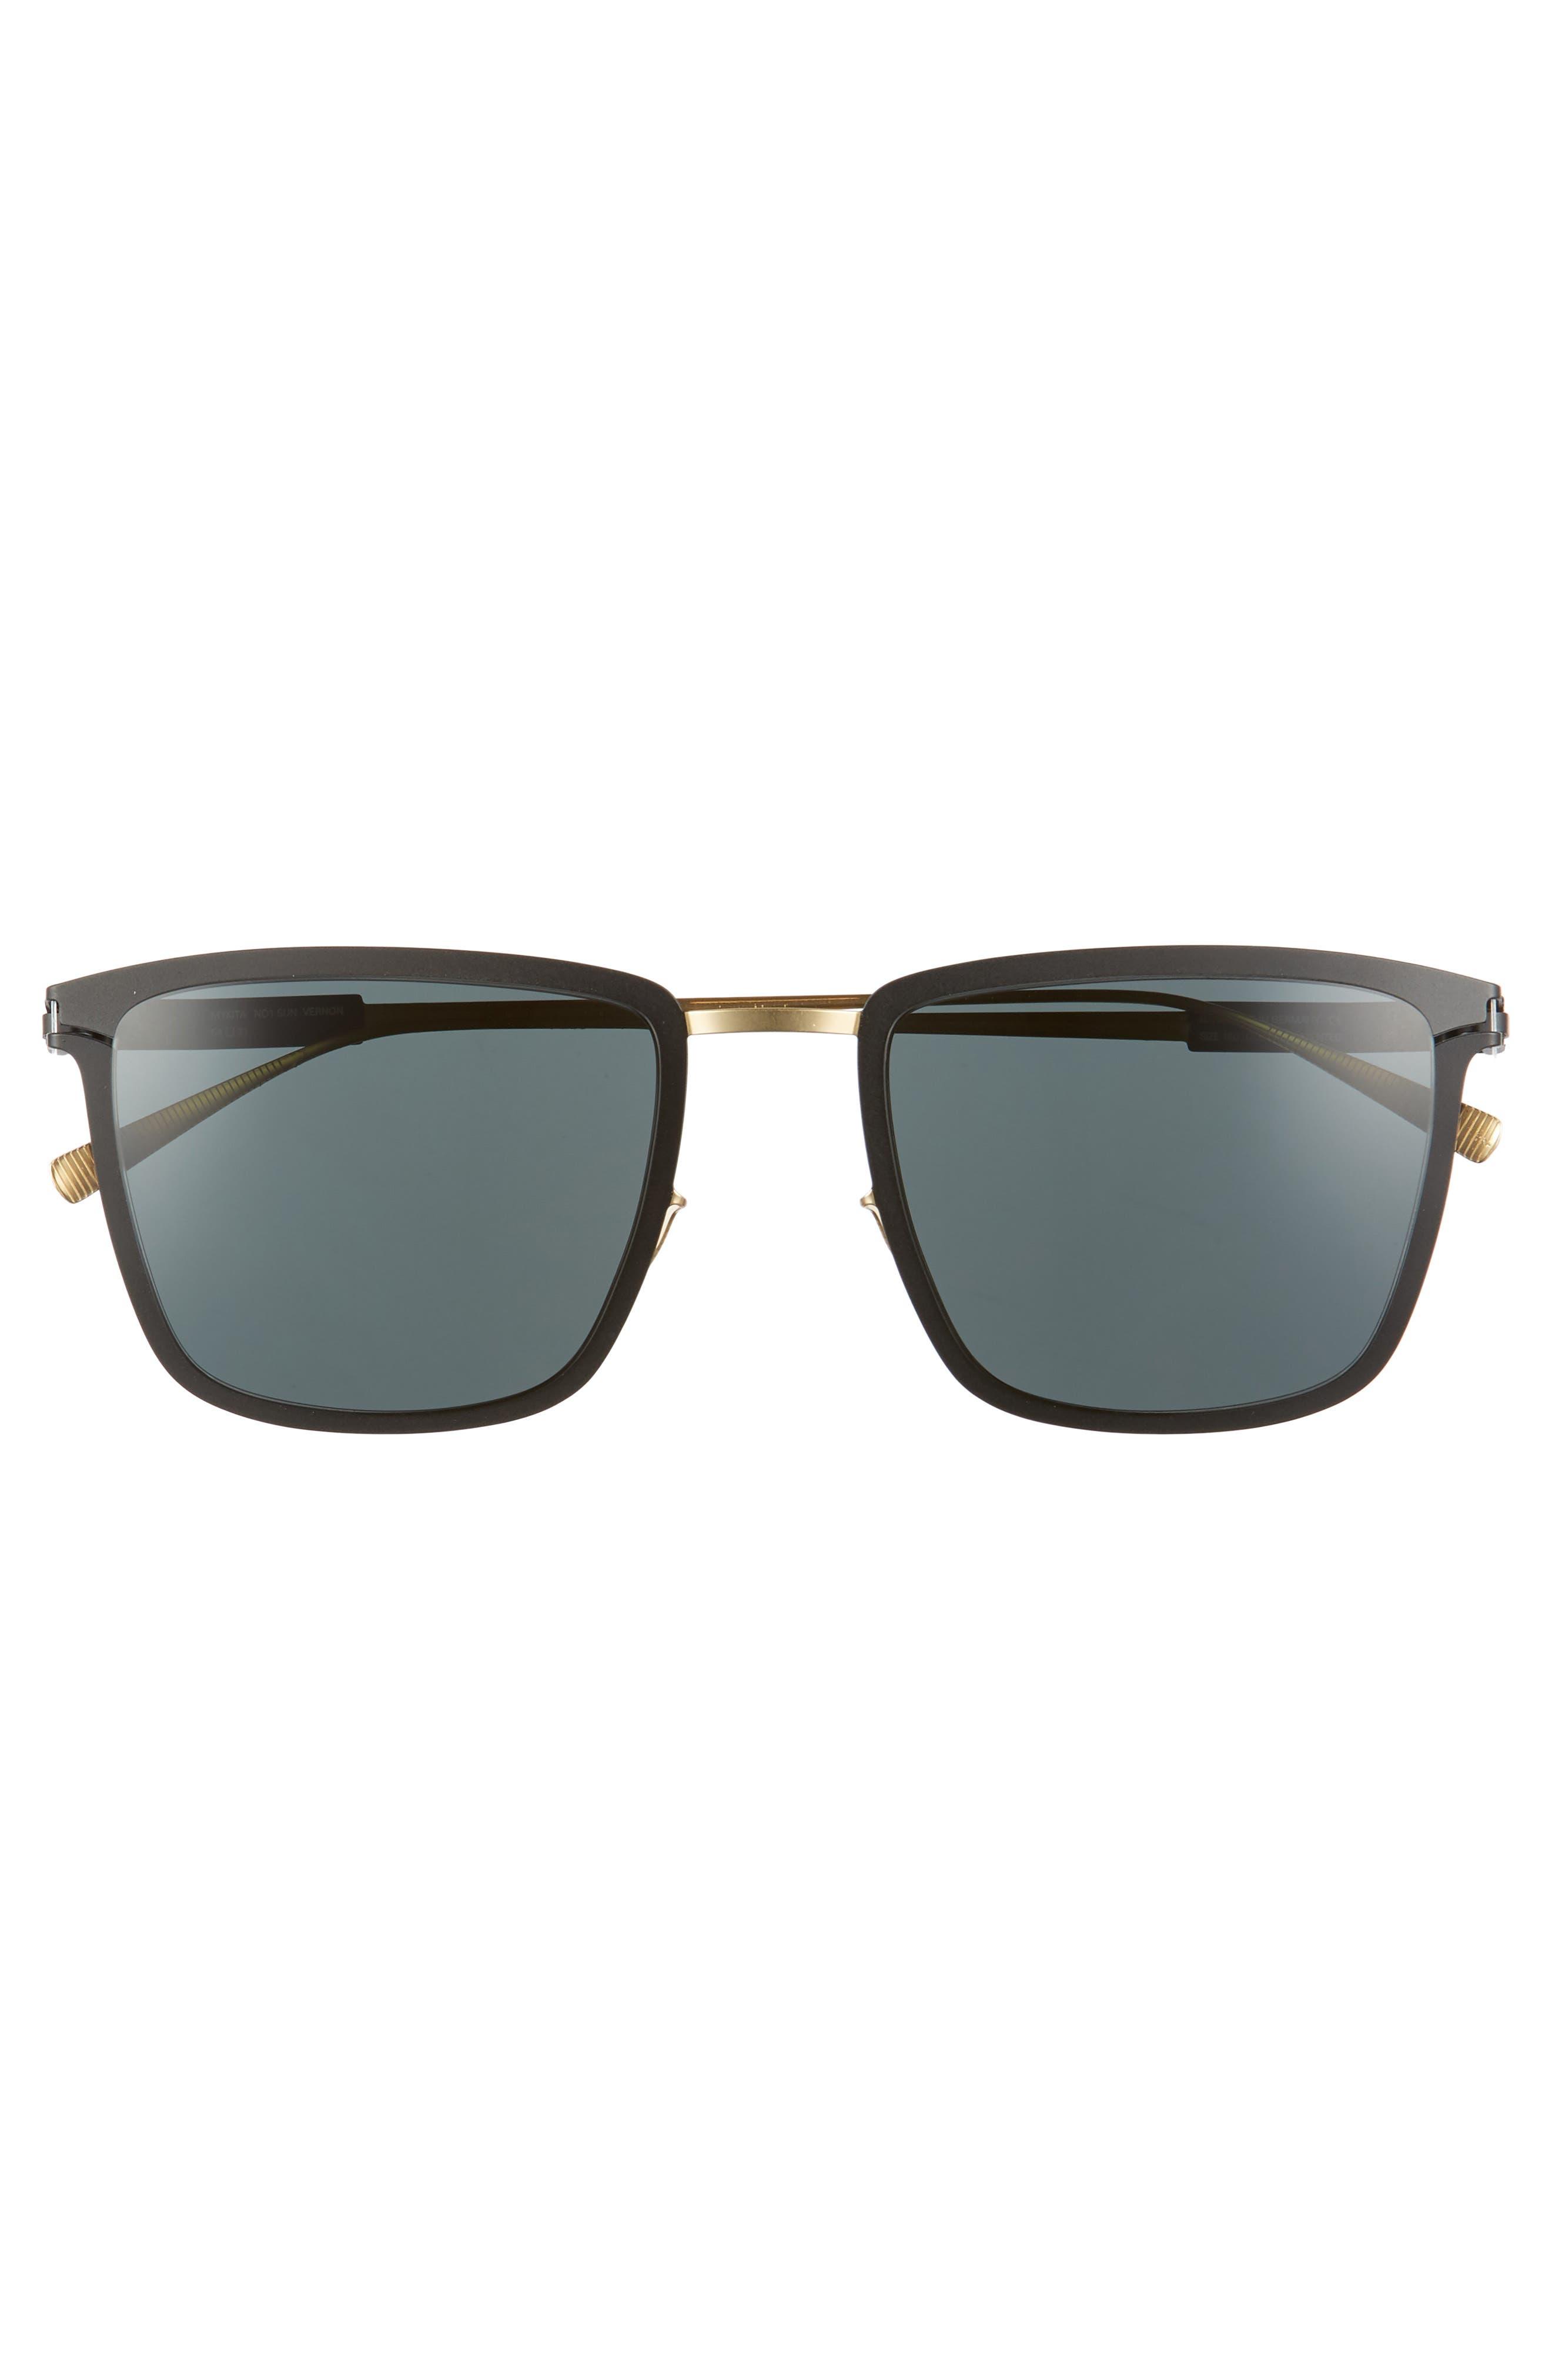 MYKITA,                             Vernon 54mm Polarized Sunglasses,                             Alternate thumbnail 2, color,                             226